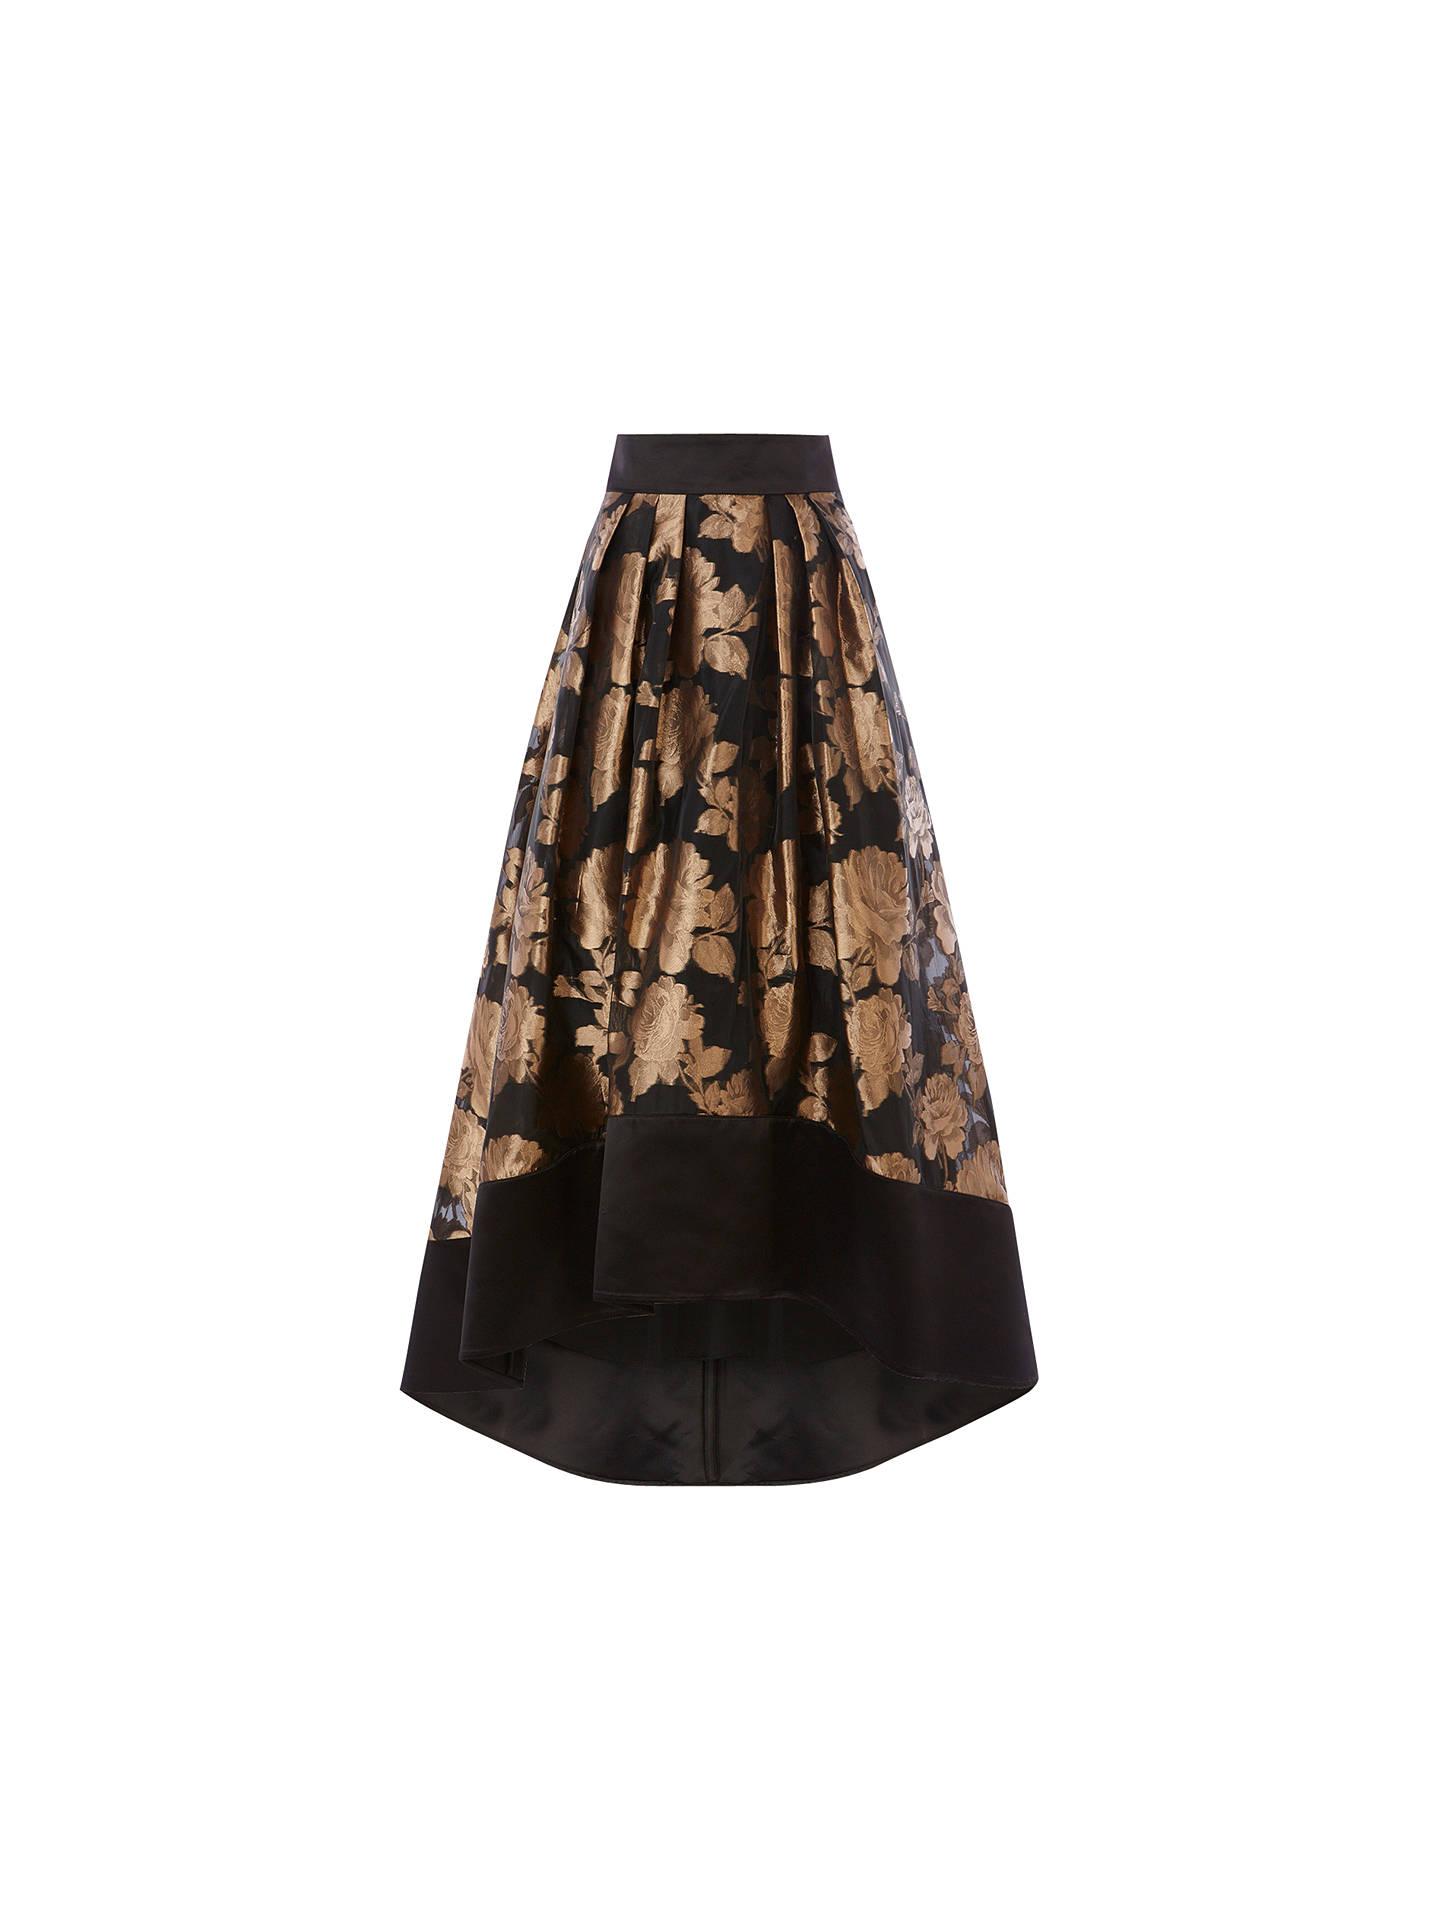 dfe48883b Buy Coast Flower Rhian Skirt, Gold, 6 Online at johnlewis.com ...